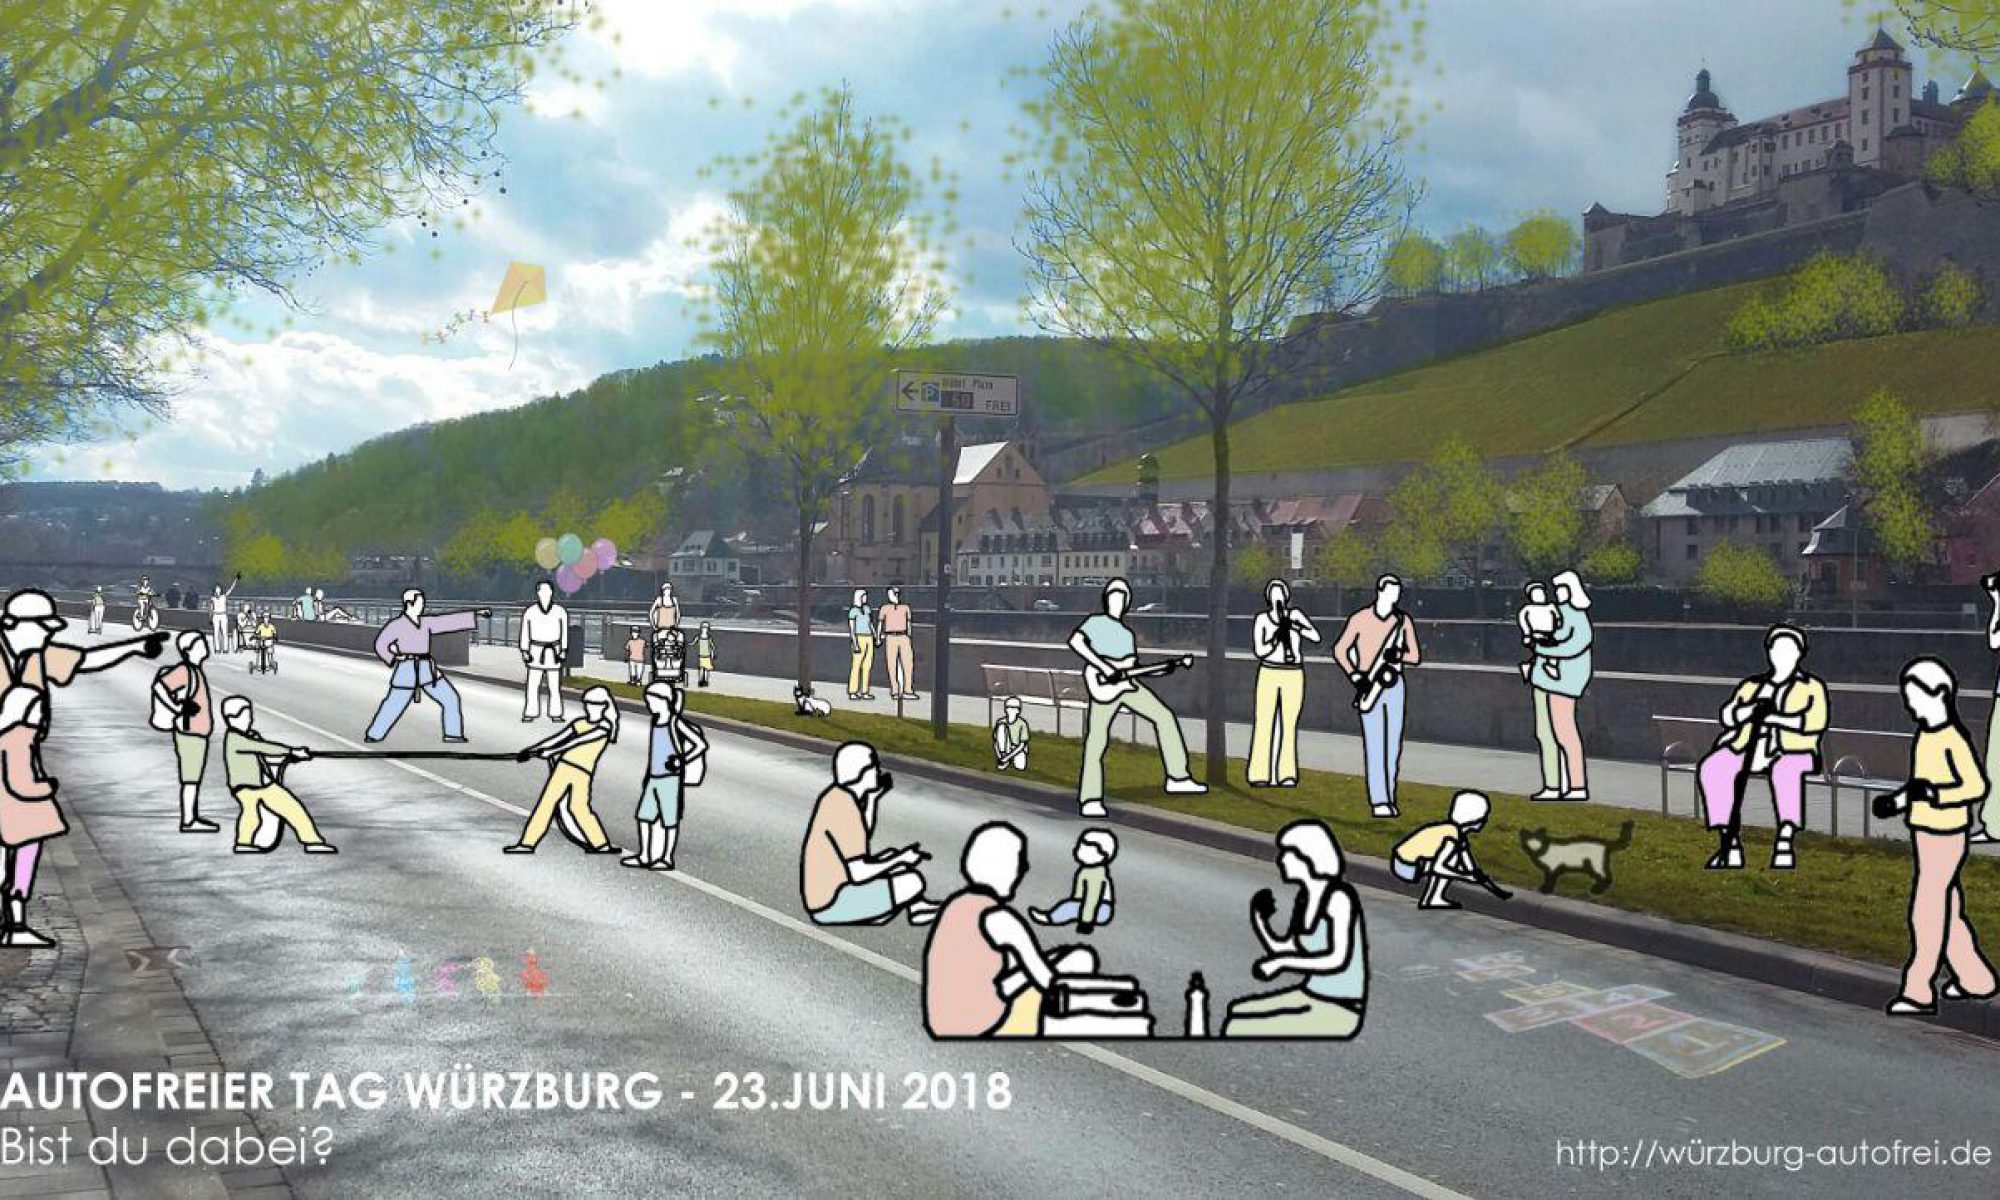 Autofreier Tag Würzburg - 21 September 2019